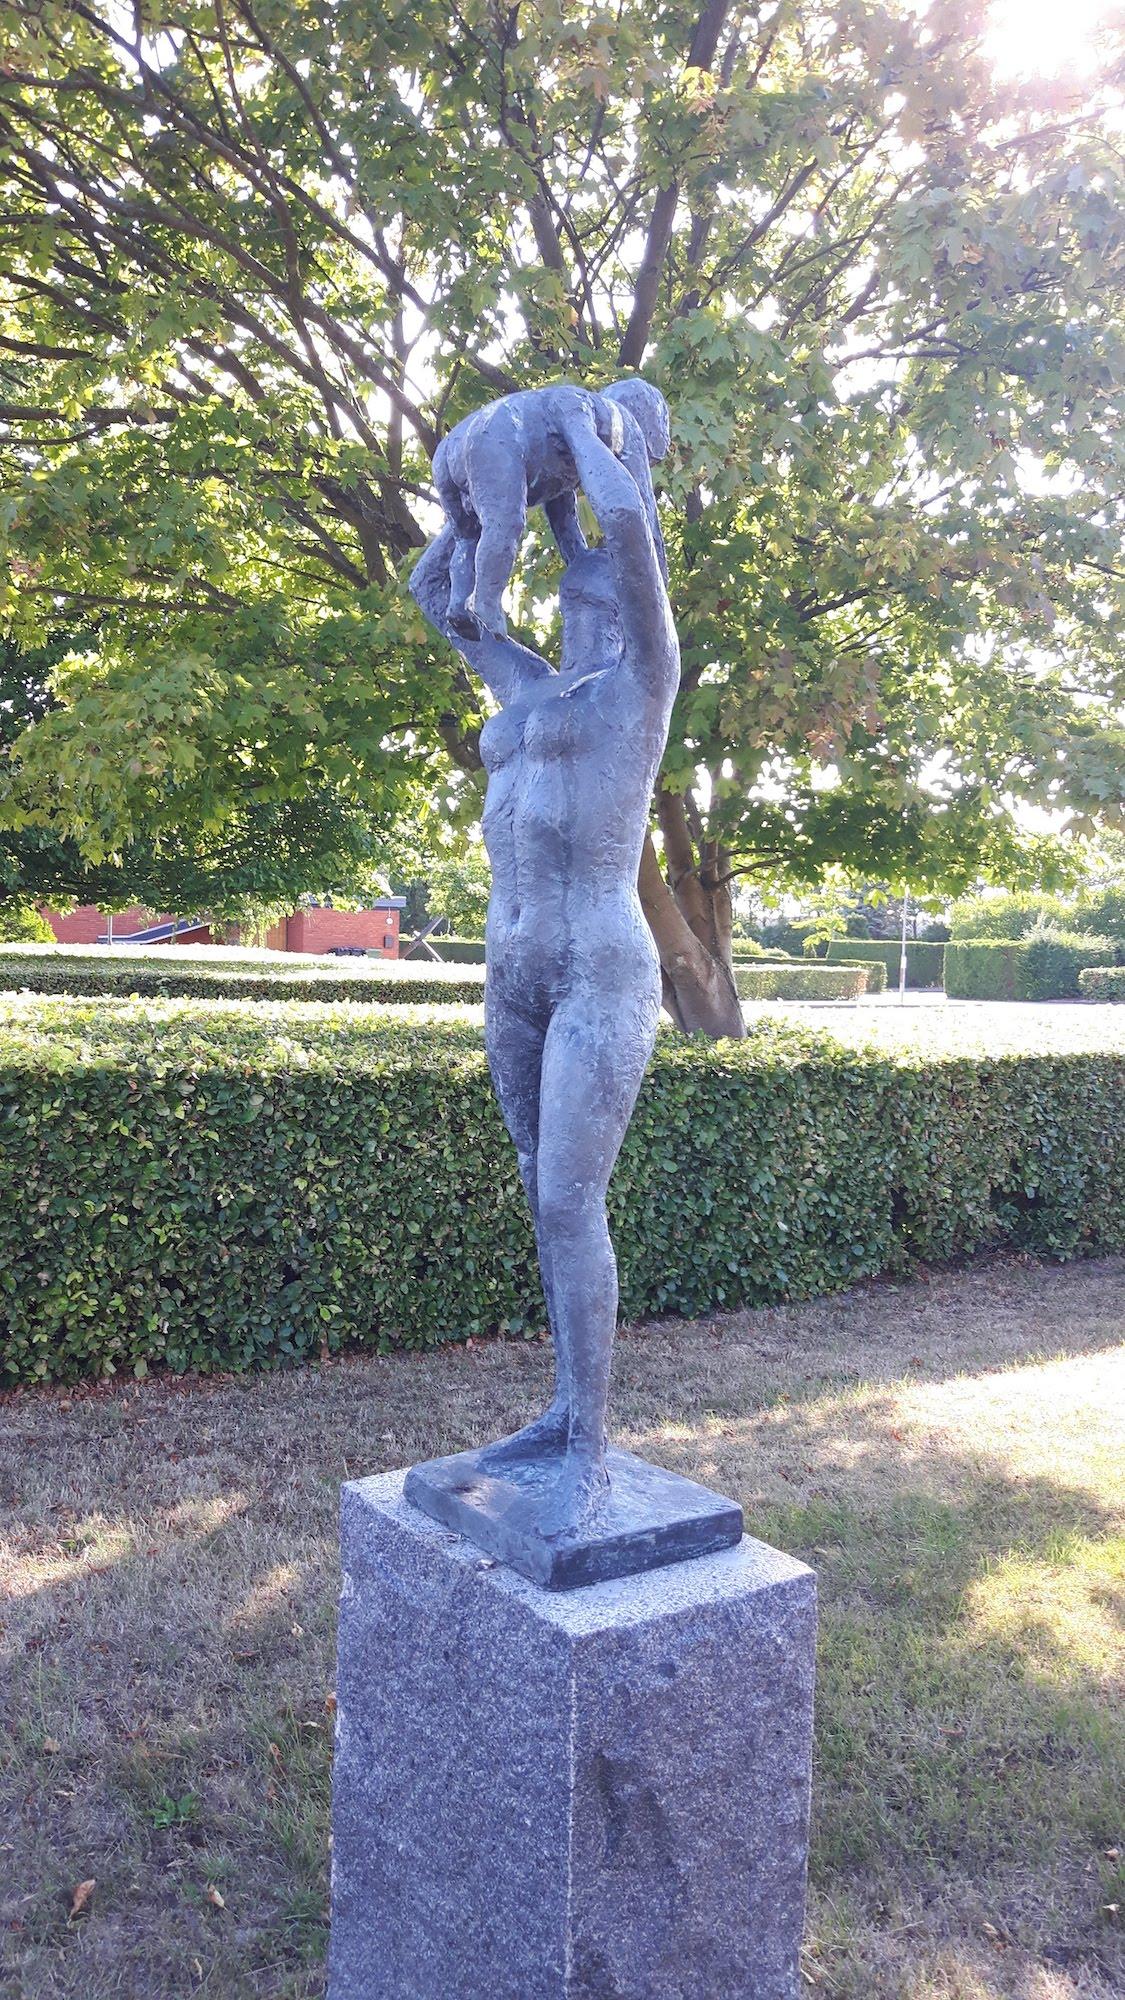 Statue Rodbyhavn Denmark